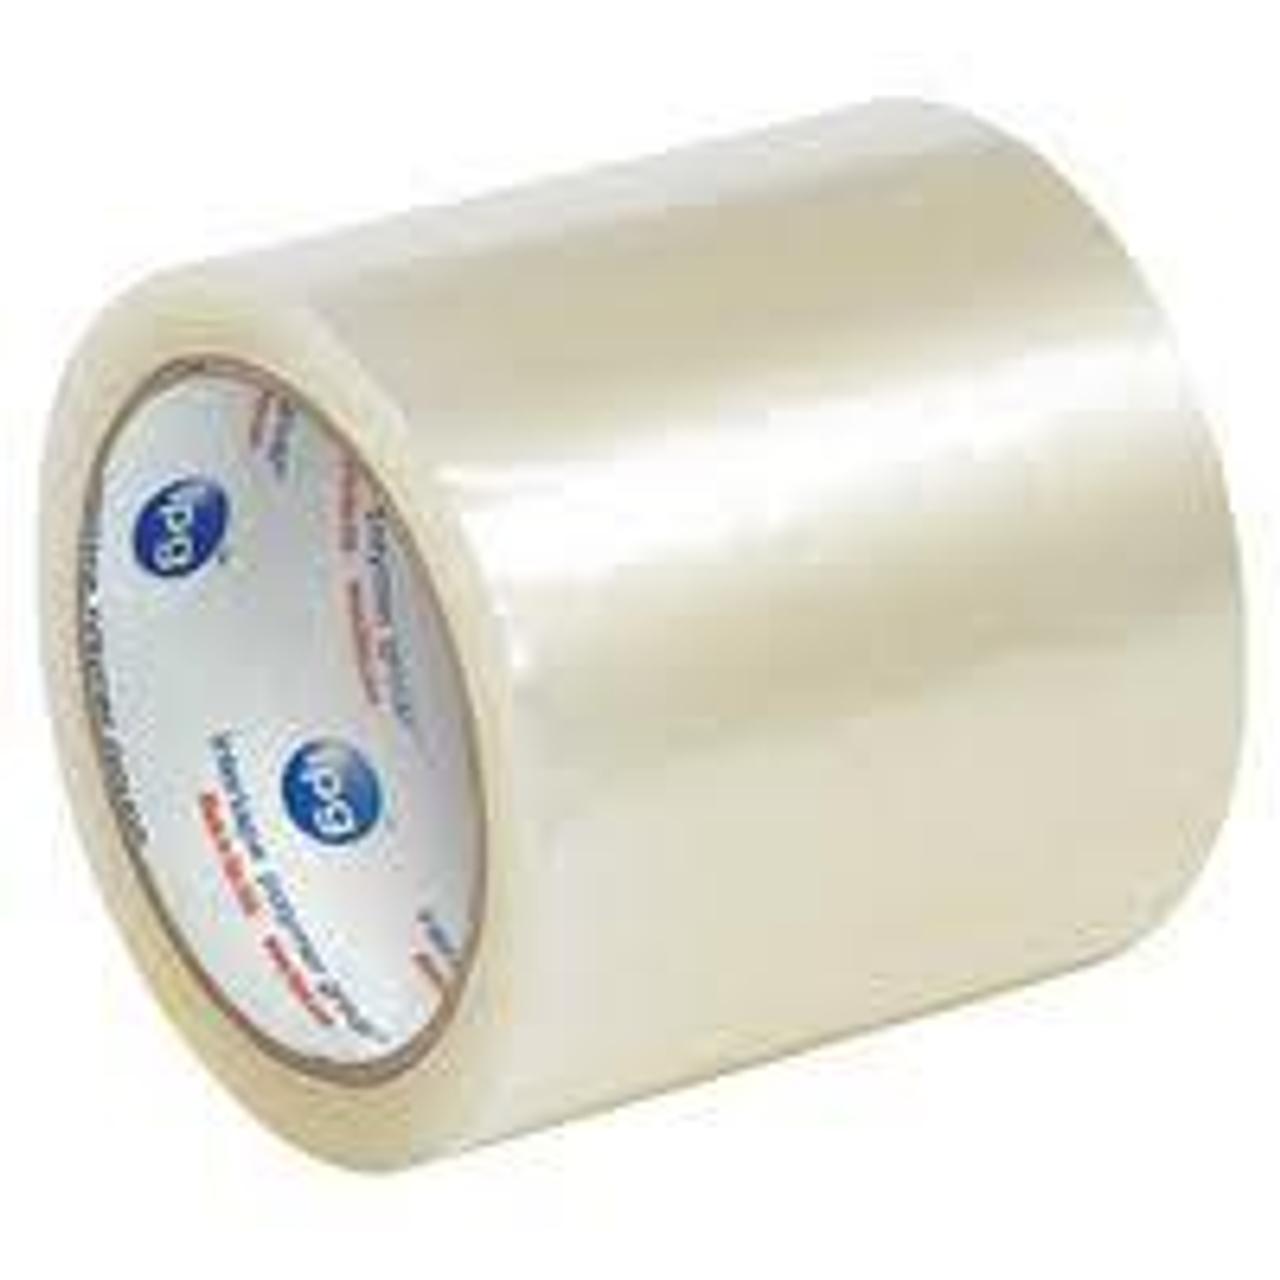 Case of 36 Rolls Primetac Premier 2 x 110 1.75 Mil Clear Acrylic Carton Sealing Tape